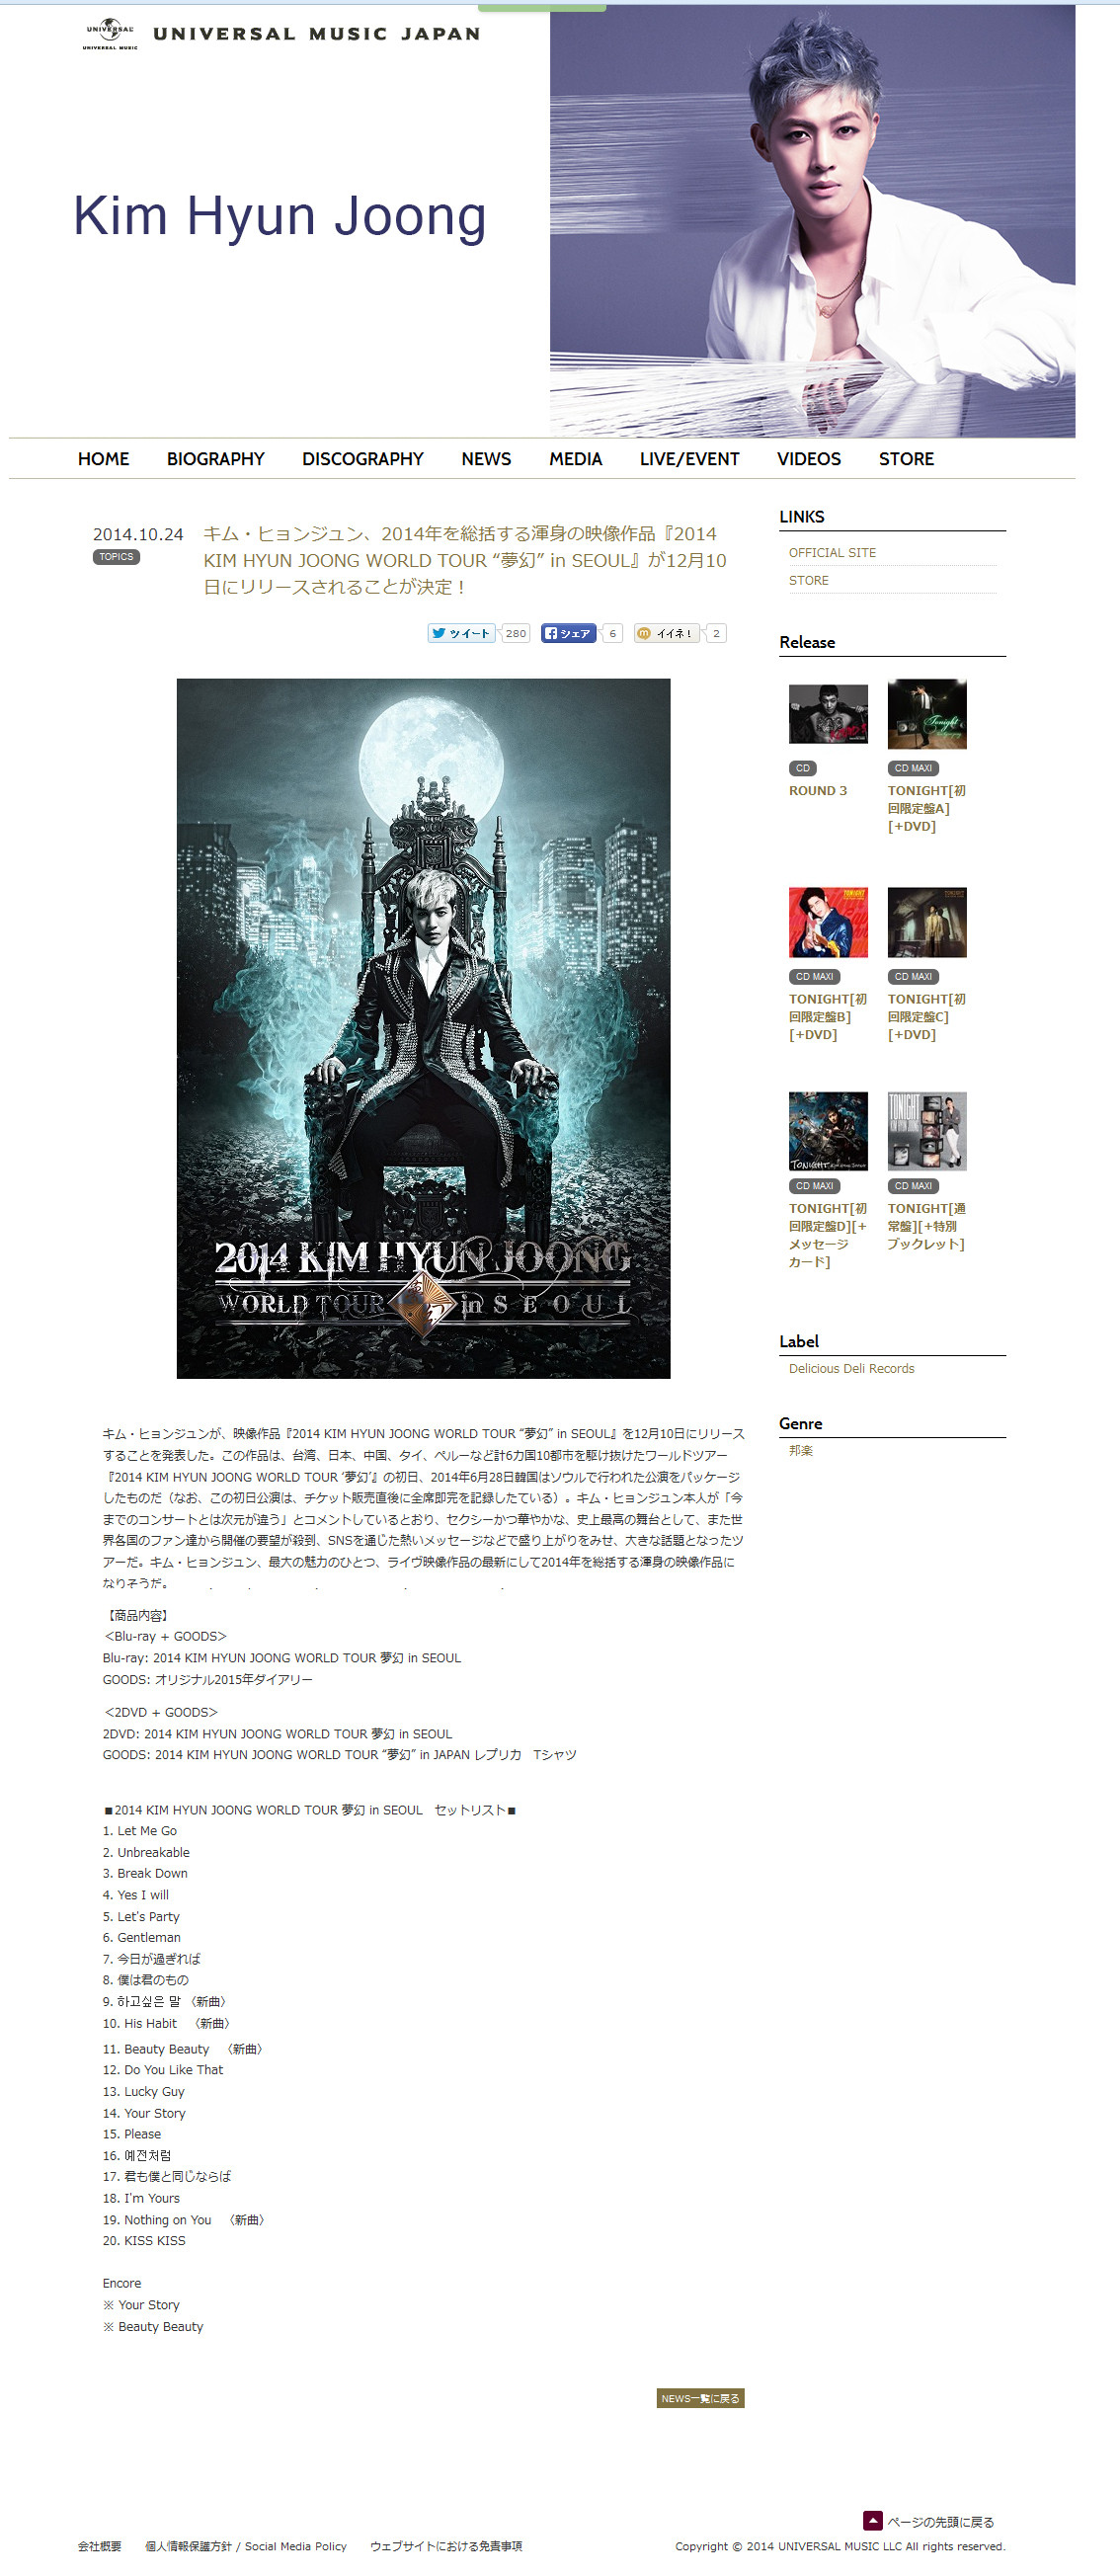 Info_KIM HYUN JOONG 2014 Phantasm in Seoul DVD & Blu-Ray